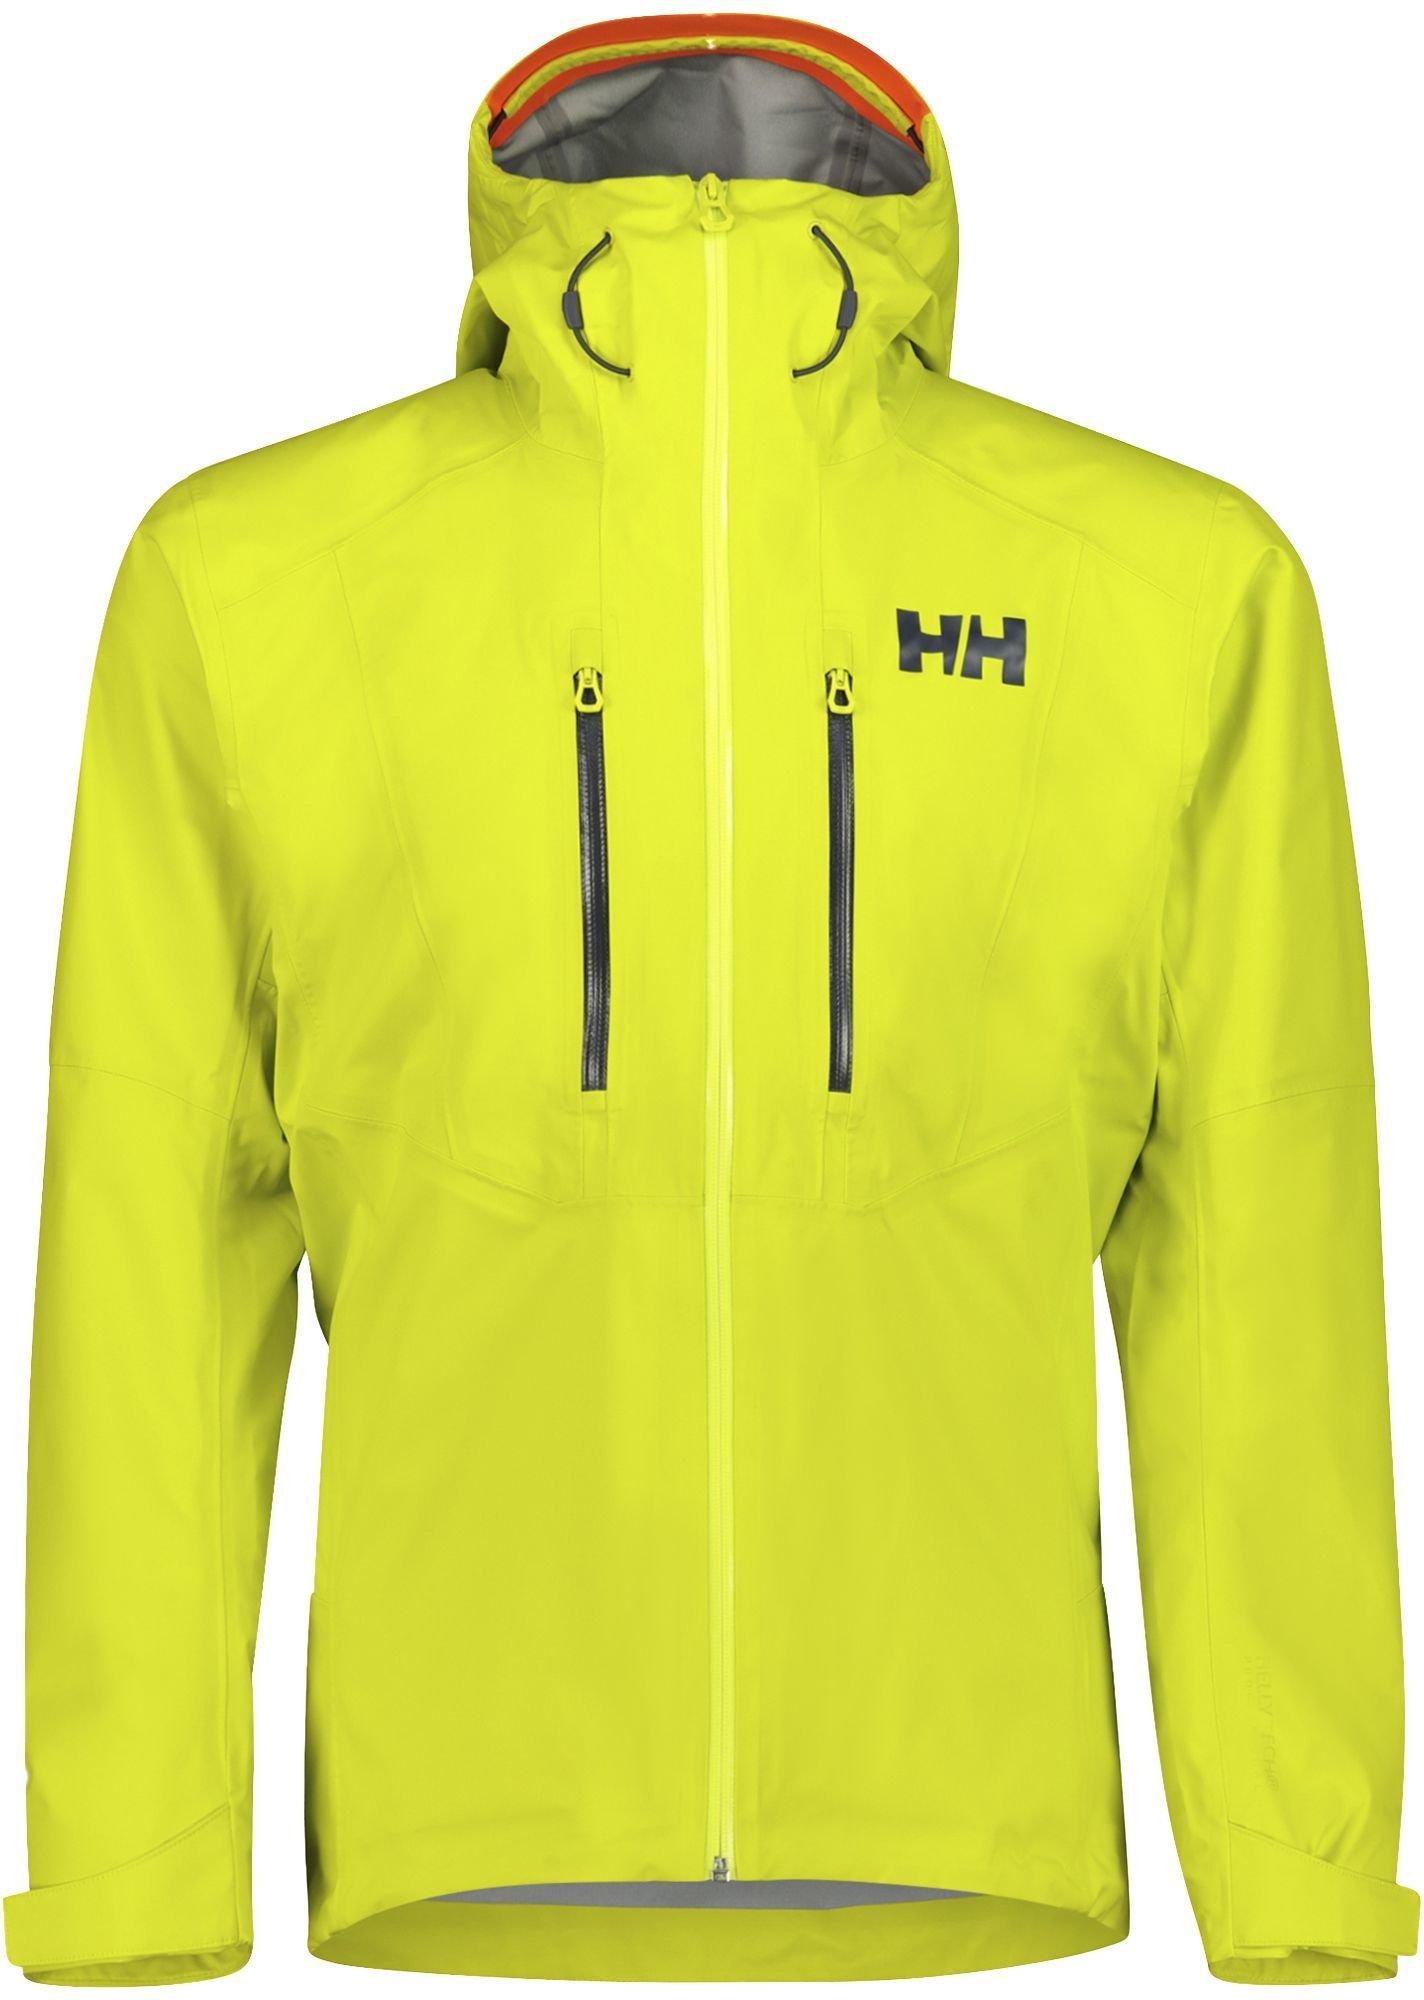 Helly Hansen Verglas 3L Shell Jacket (Herre)